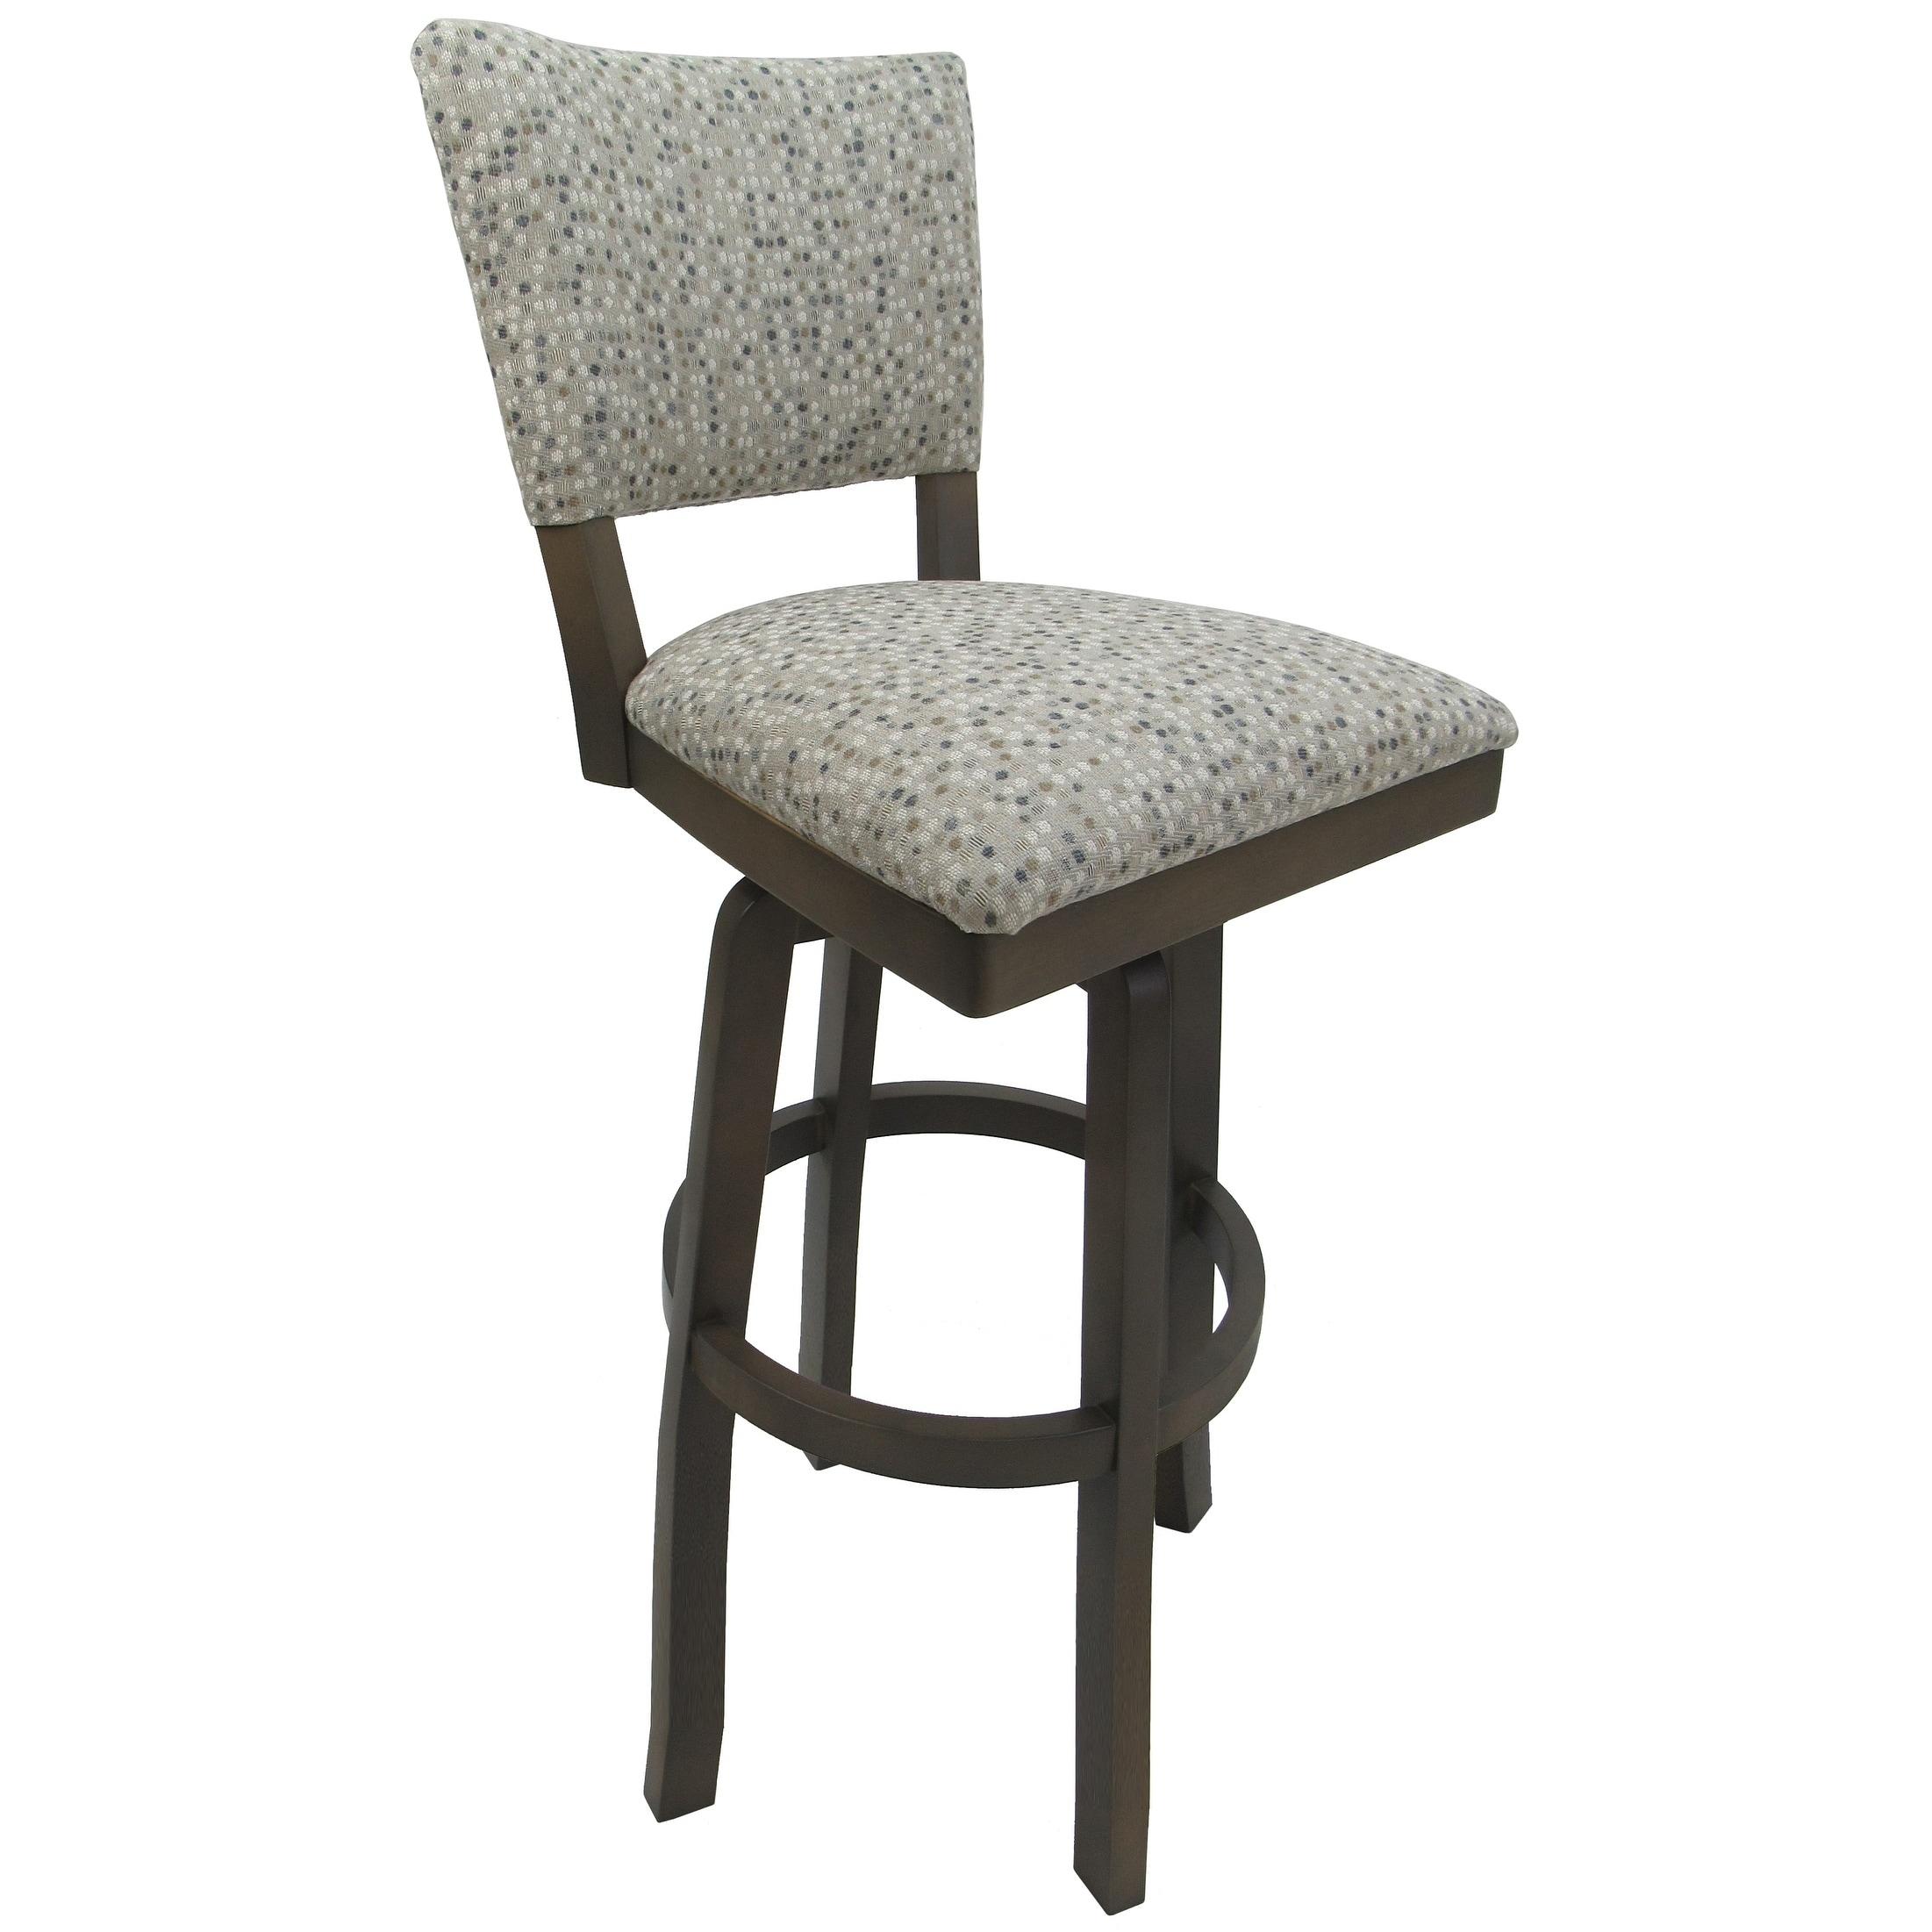 Tremendous Extra Tall Spectator Swivel Wood Bar Stool 34 Milan Spring Mix 34 Seat Uwap Interior Chair Design Uwaporg